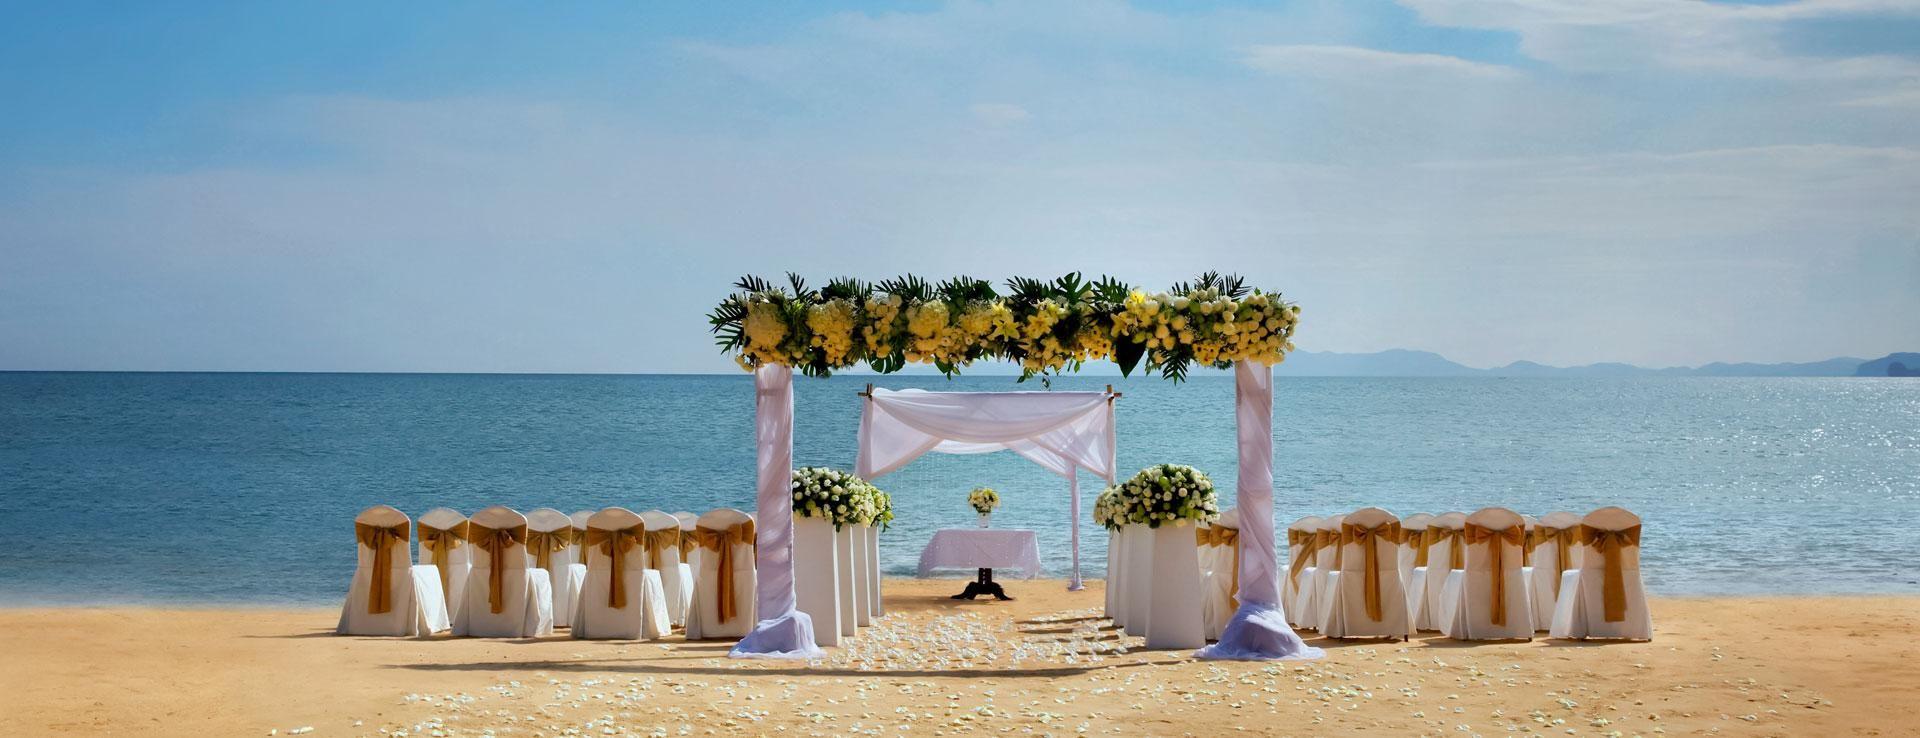 Special offers at Pullman Danang Beach Resort, Vietnam